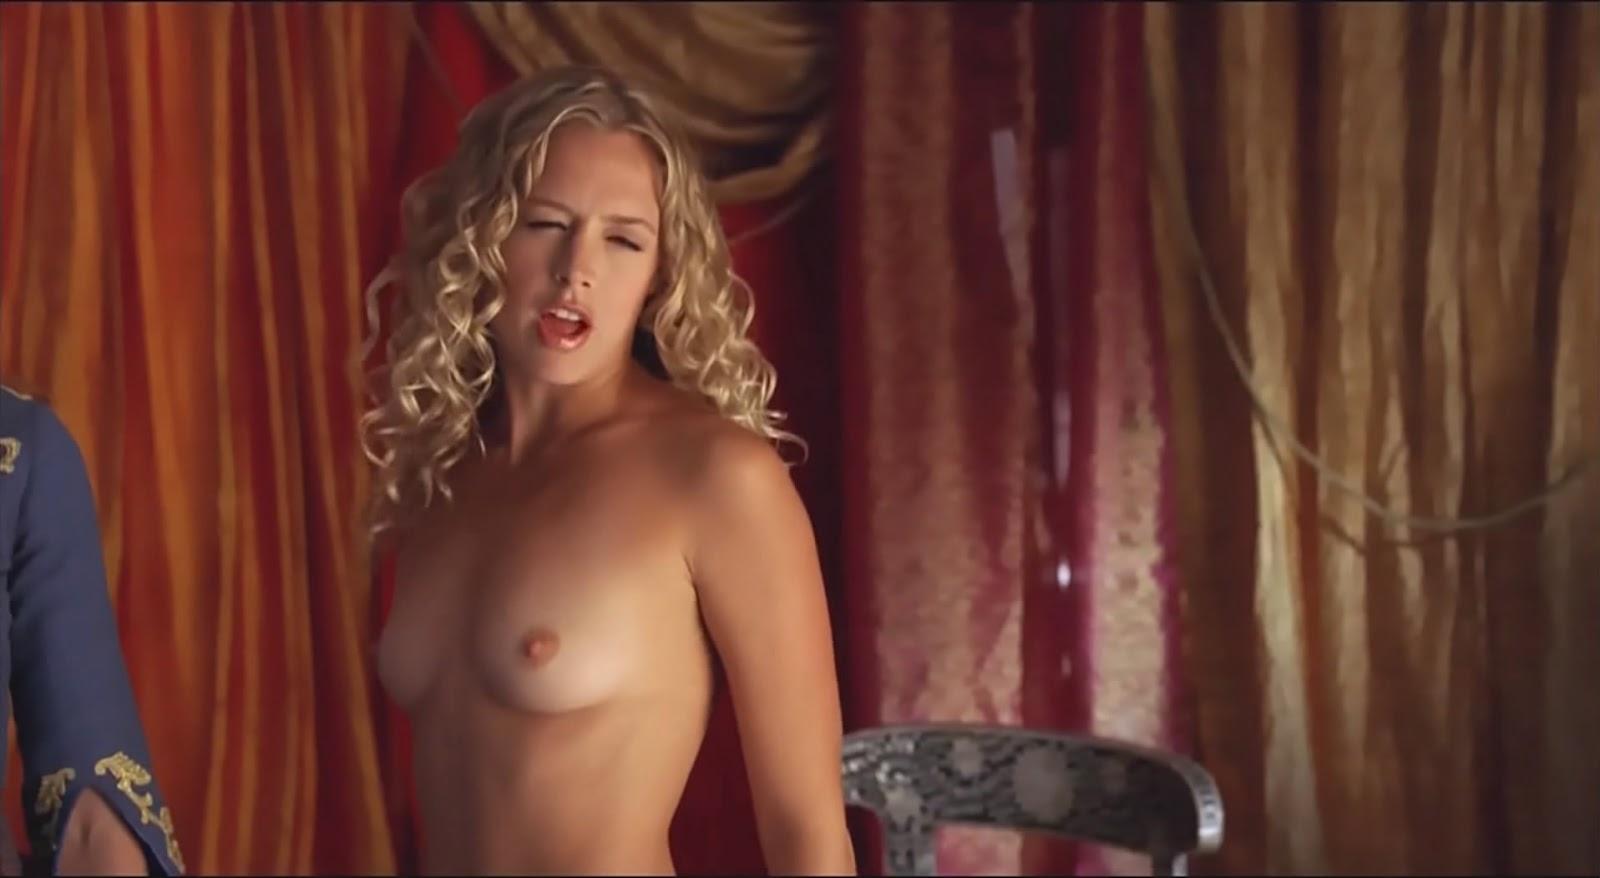 Epic movie porn hentai toons